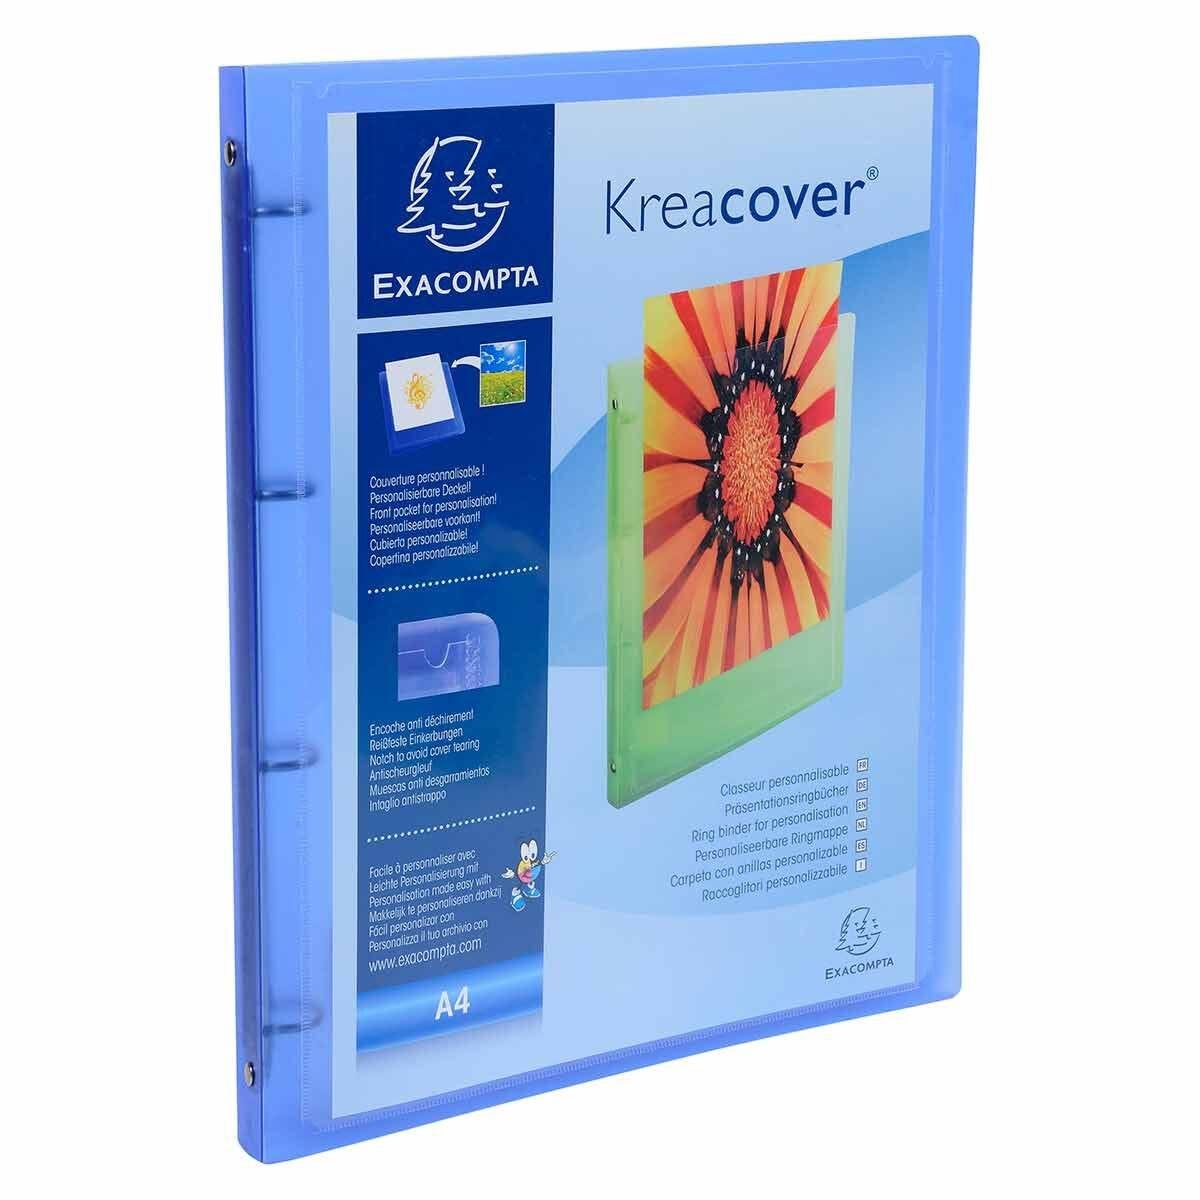 Exacompta Kreacover ChromaLine Ring Binder A4 4 Ring 15mm Pack of 12